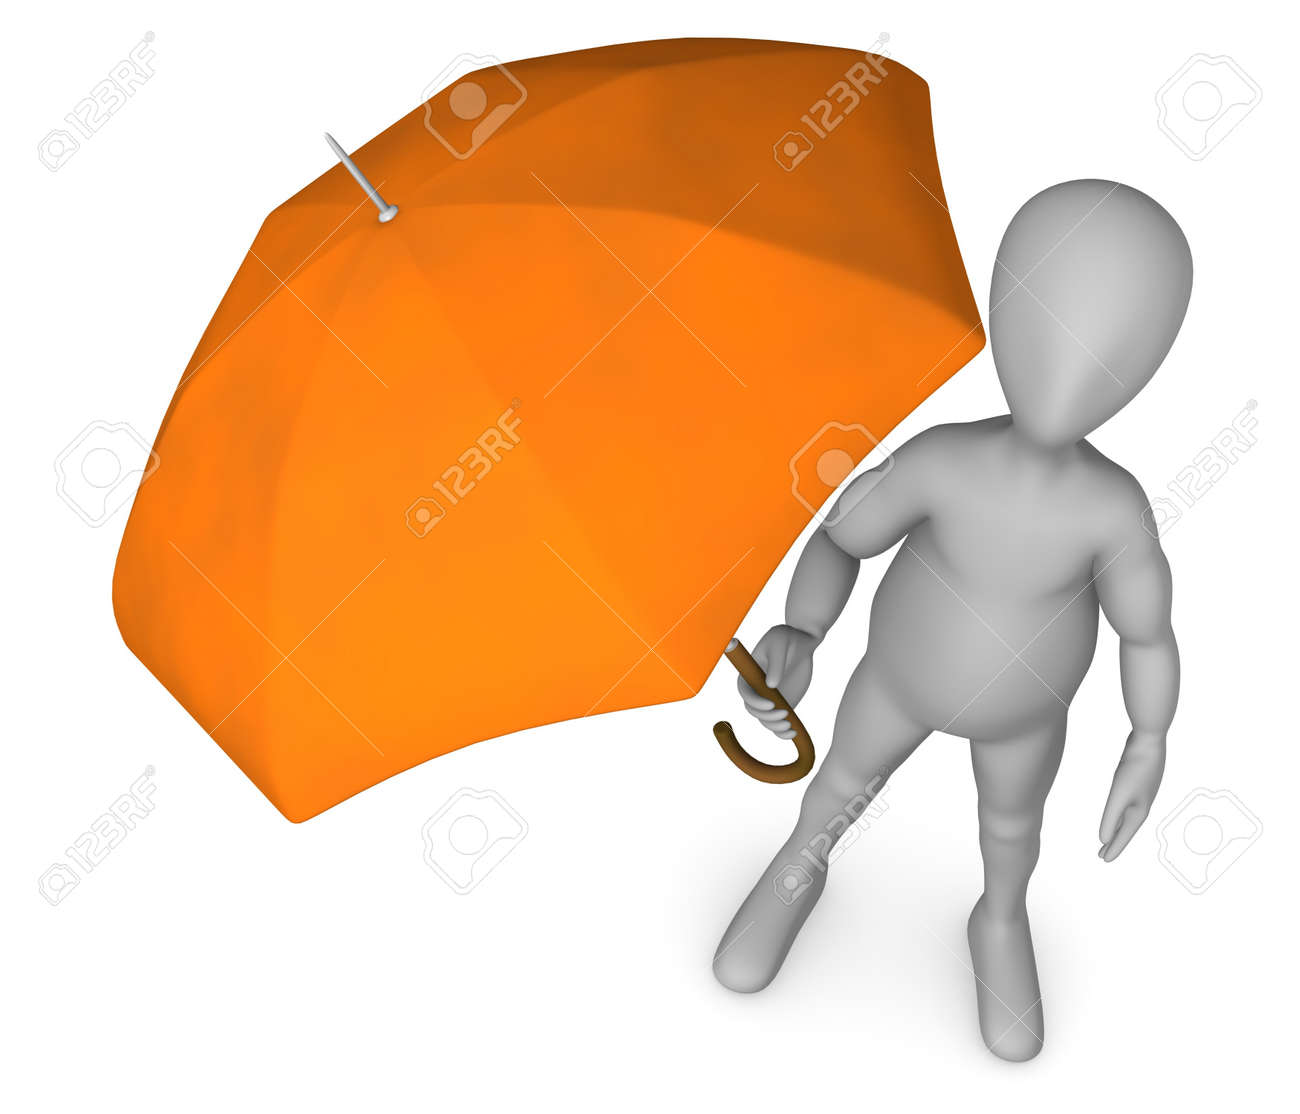 3d render of cartoon character with umbrella Stock Photo - 12969069